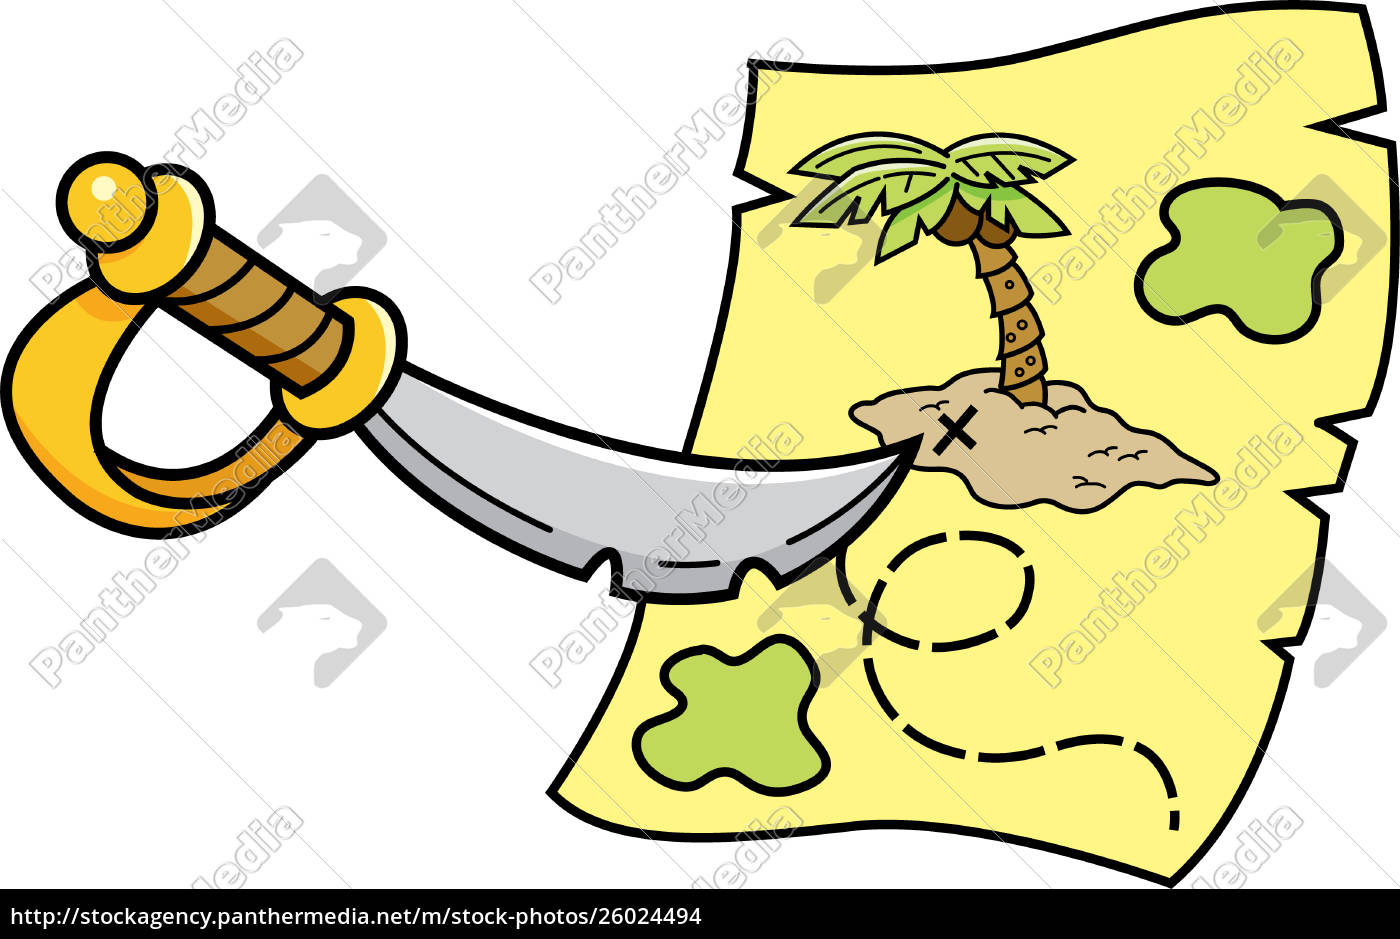 cartoon, illustration, of, a, sword, pointing - 26024494